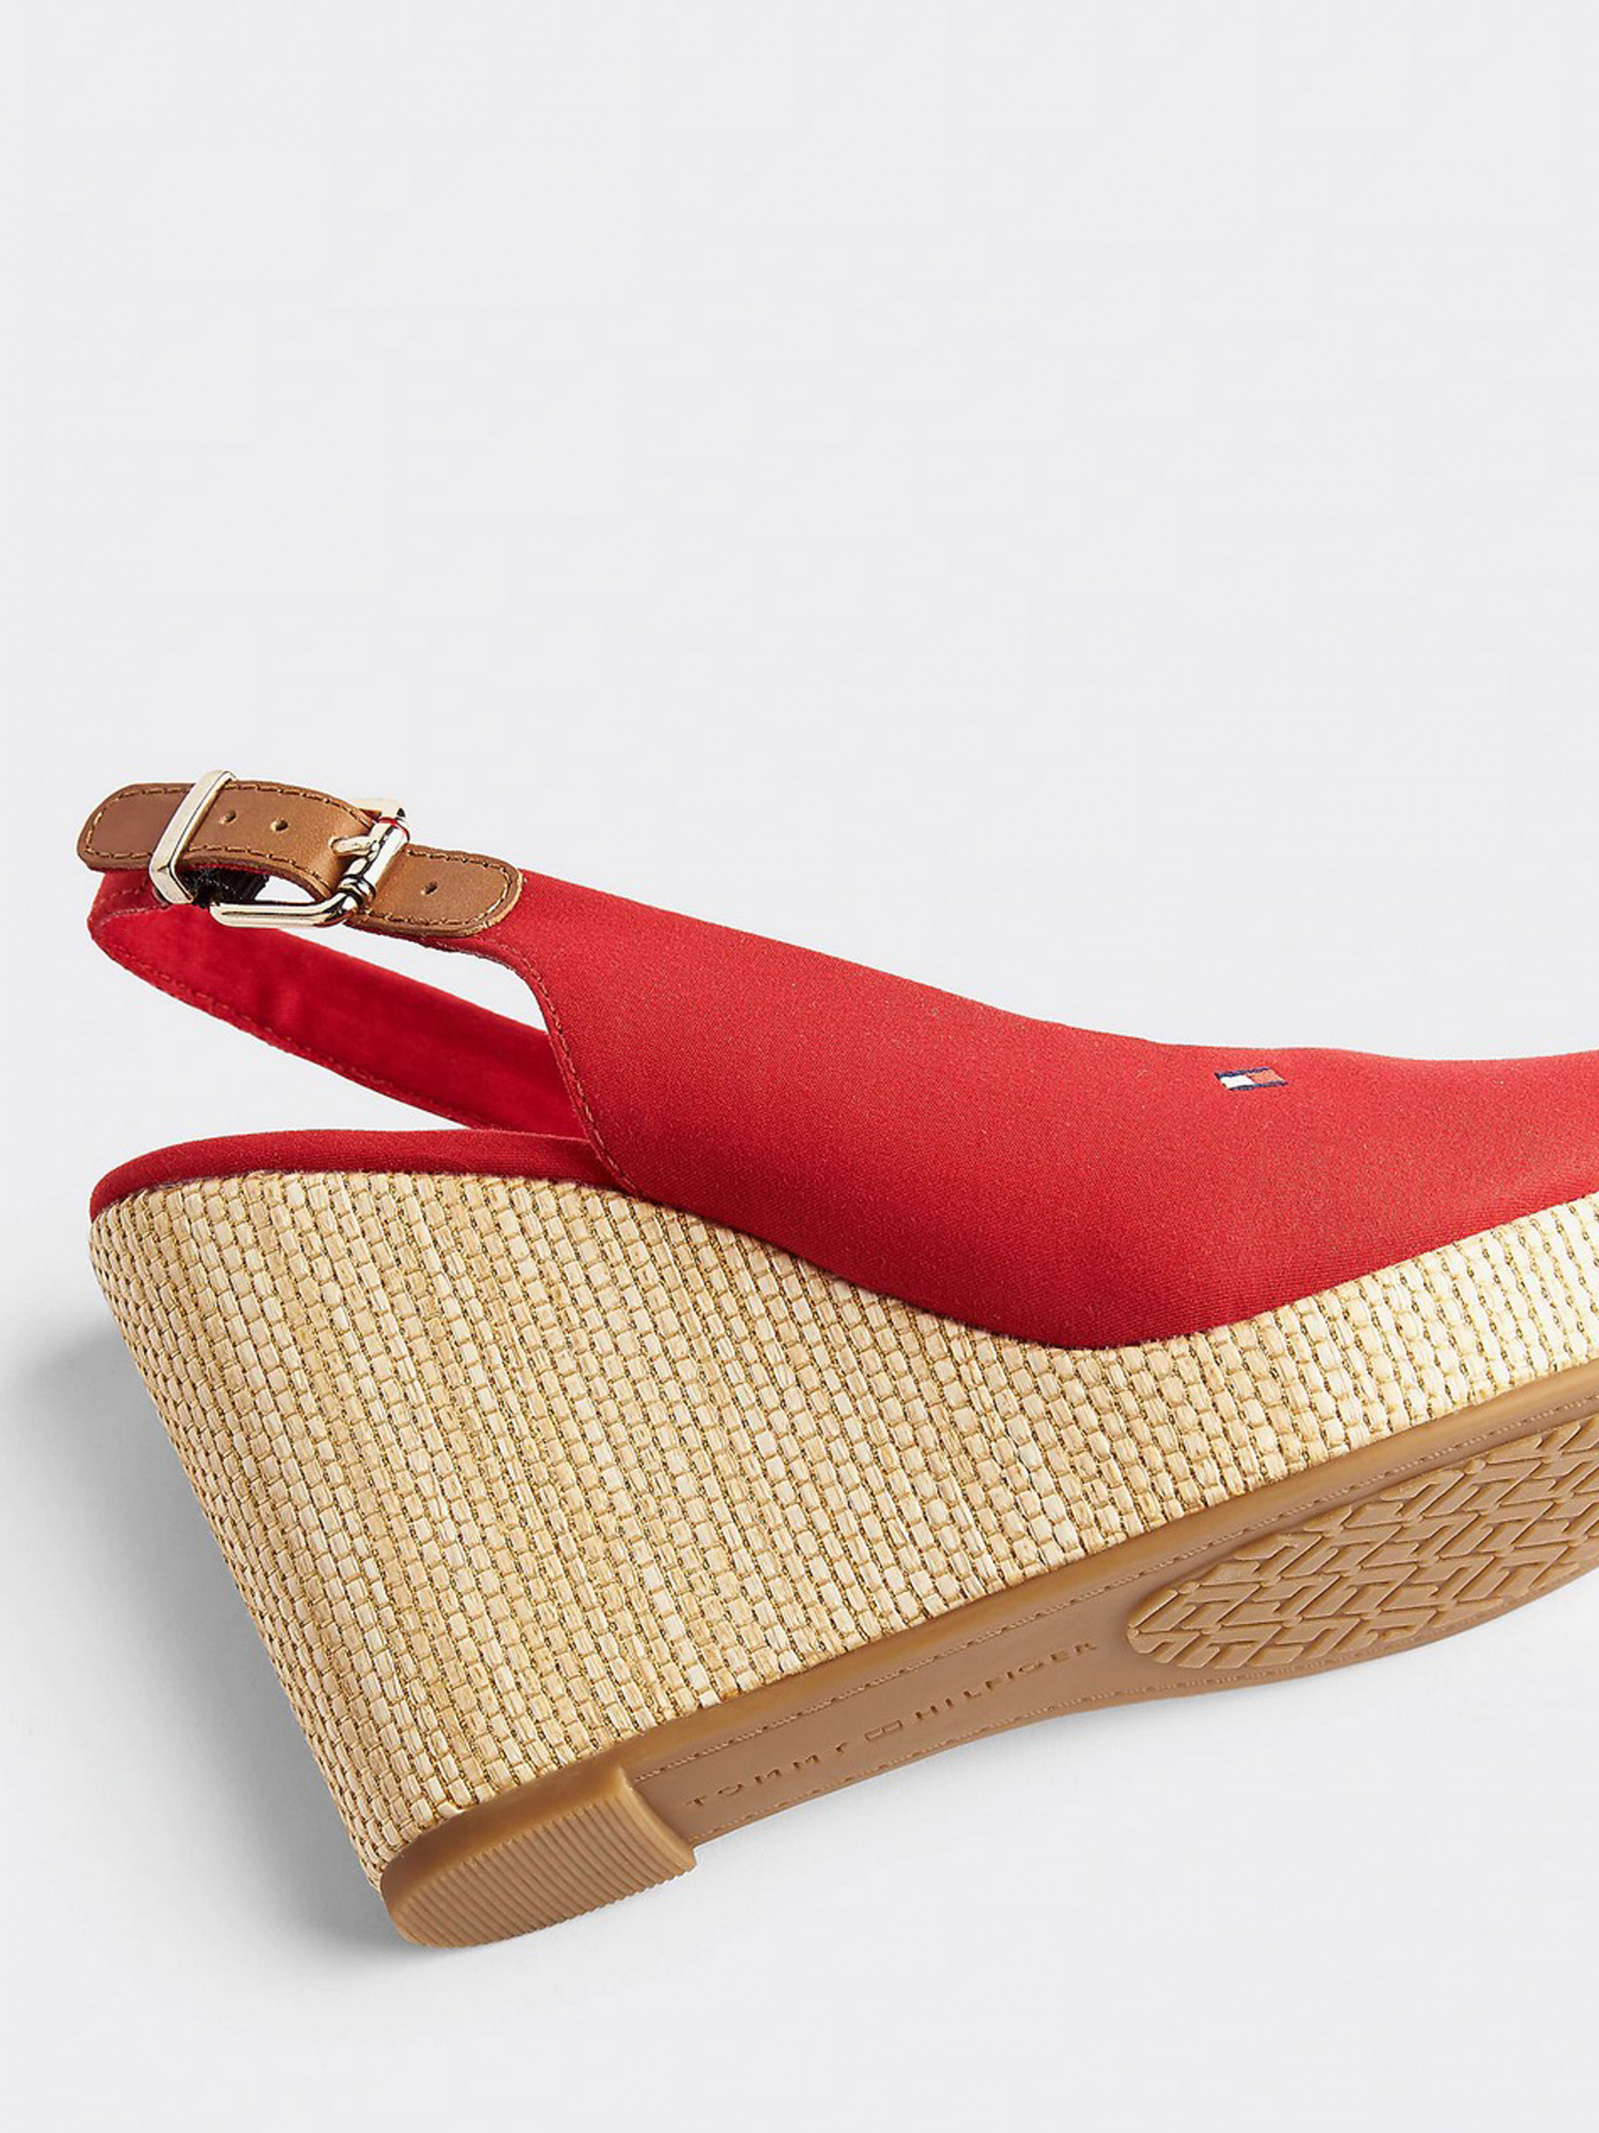 Босоніжки  для жінок Tommy Hilfiger ICONIC ELENA SLING BACK WEDGE FW0FW04789-XLG розмірна сітка взуття, 2017